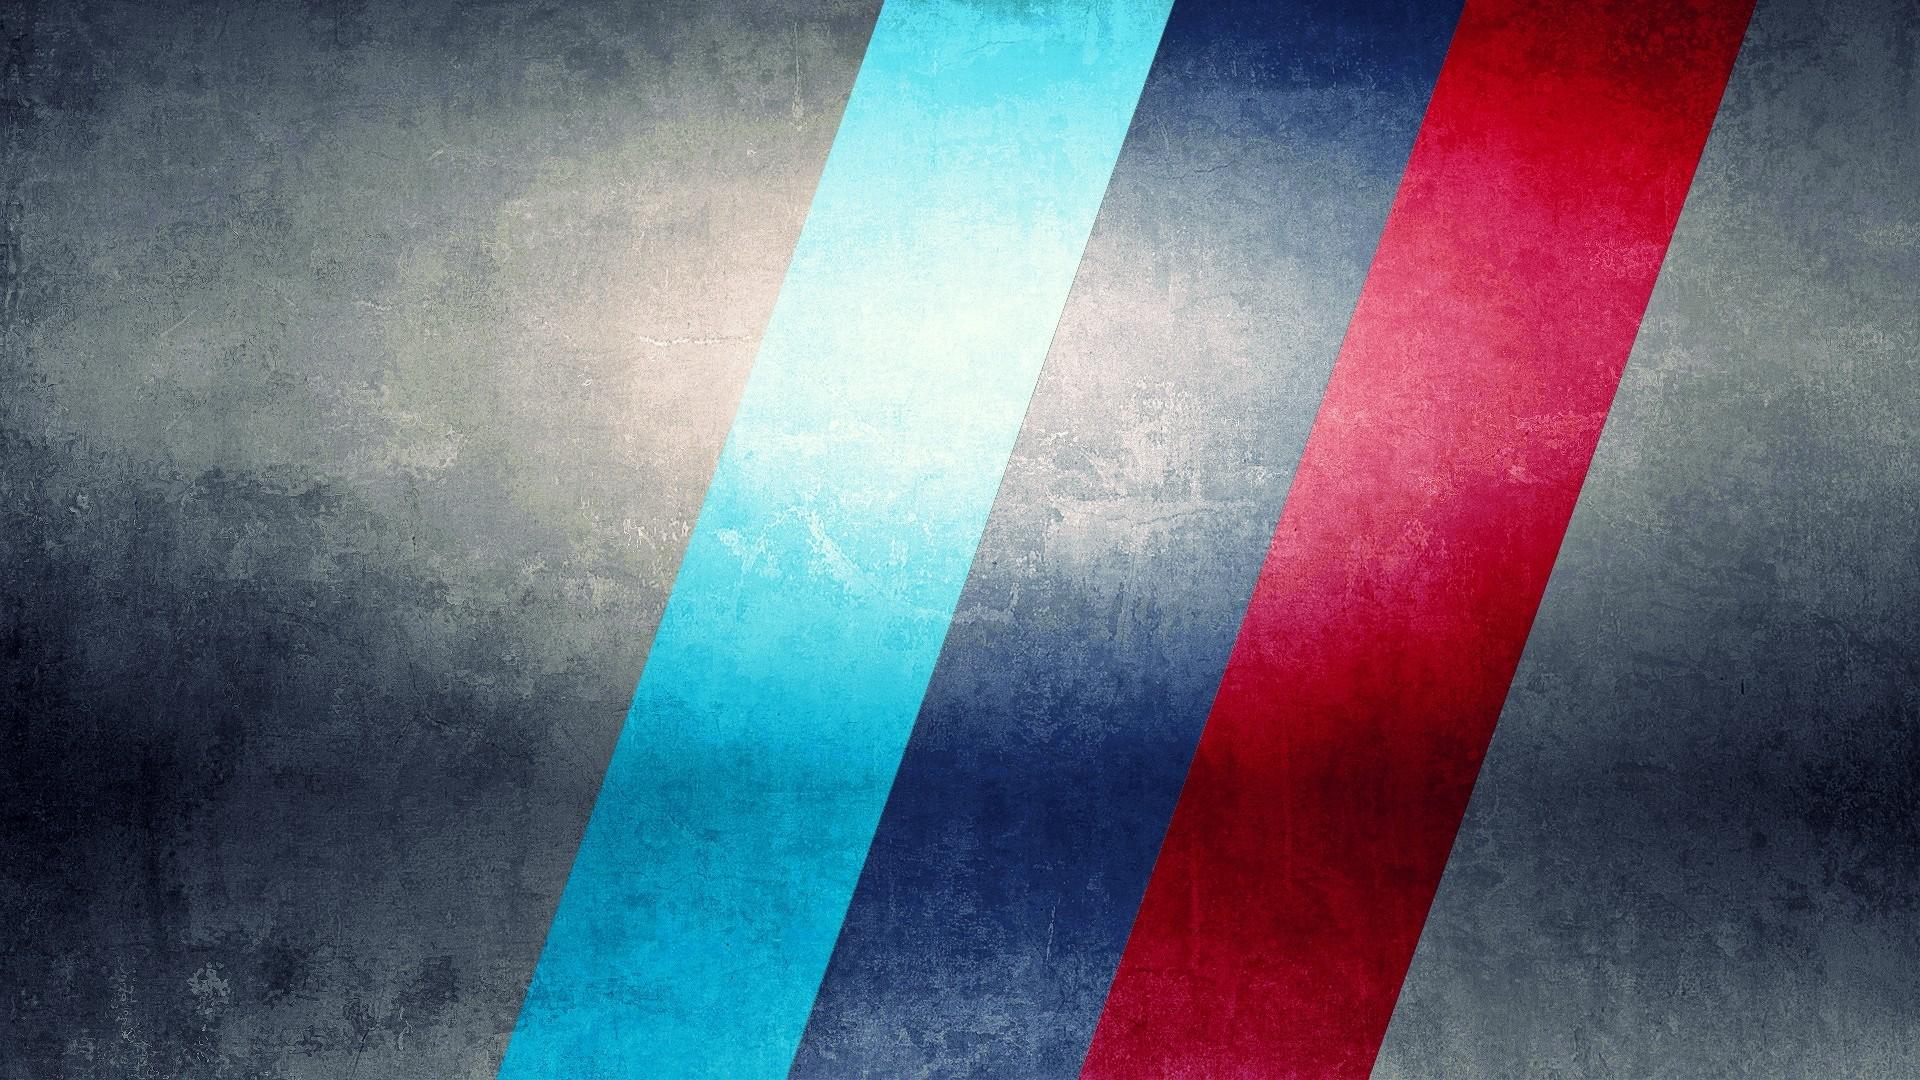 BMW M Series Wallpapers Download Desktop Wallpaper Images 1920x1080